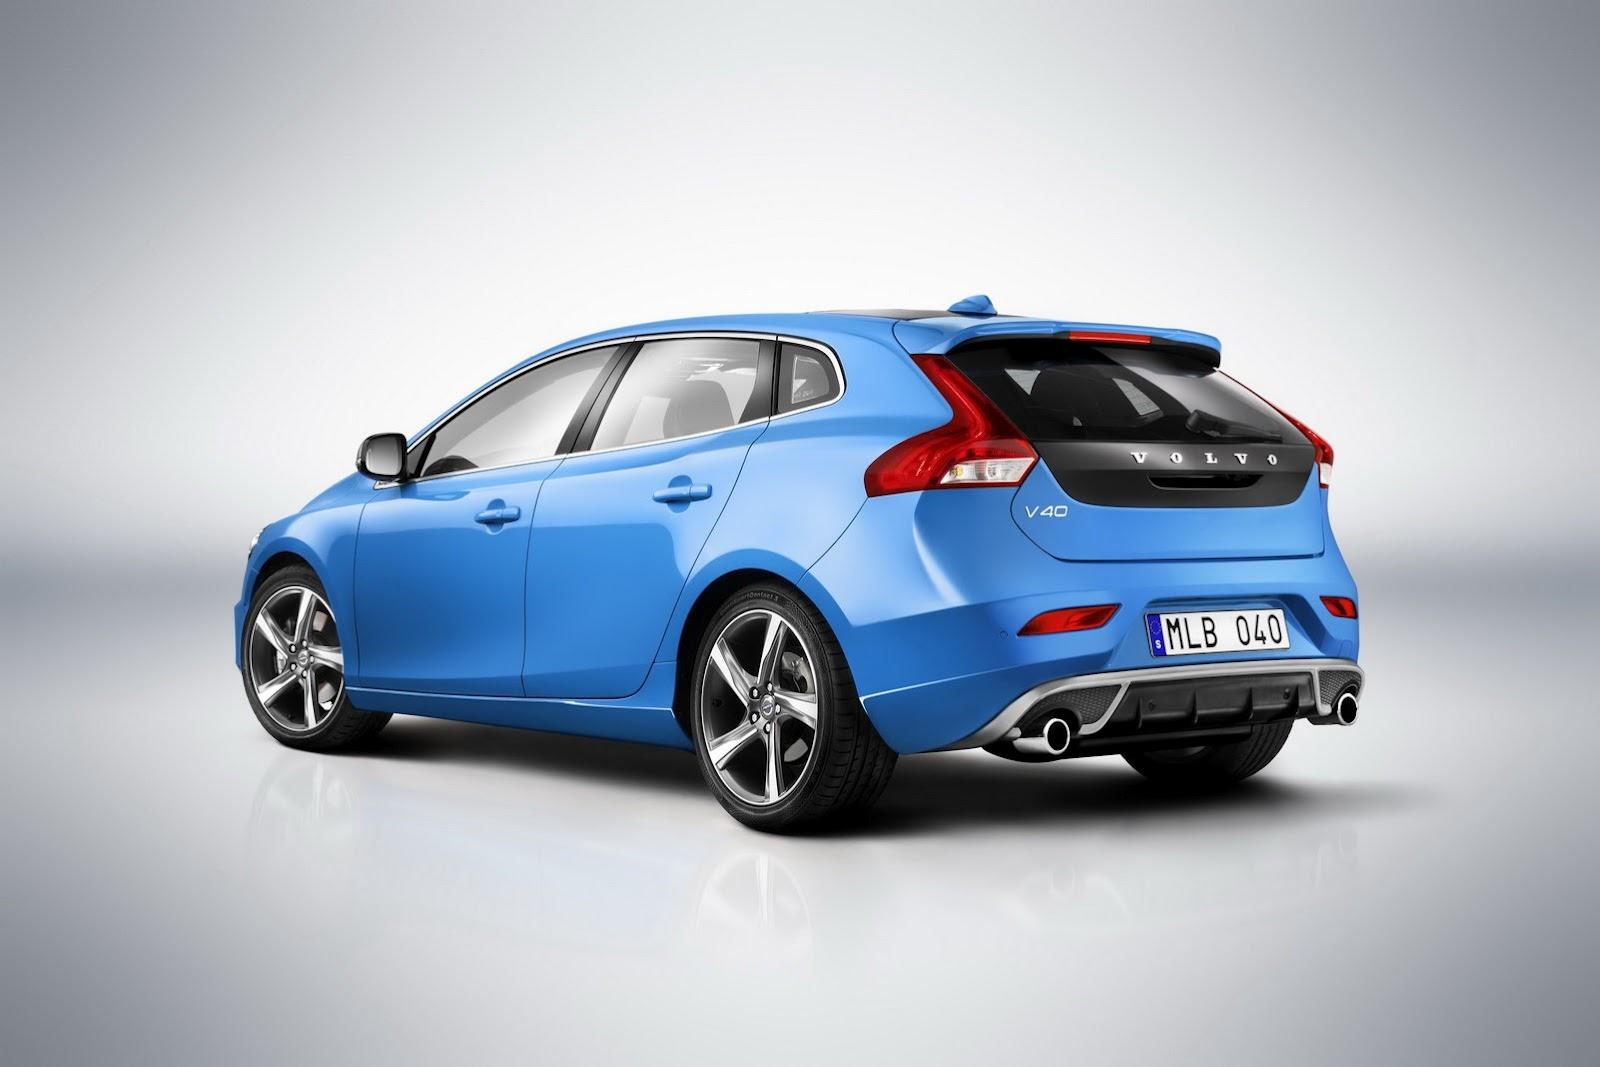 http://3.bp.blogspot.com/-5I0Adlpixs0/UHp271eRjwI/AAAAAAAABBY/KDYzvOEP-Bs/s1600/Volvo+V40+rear.jpg